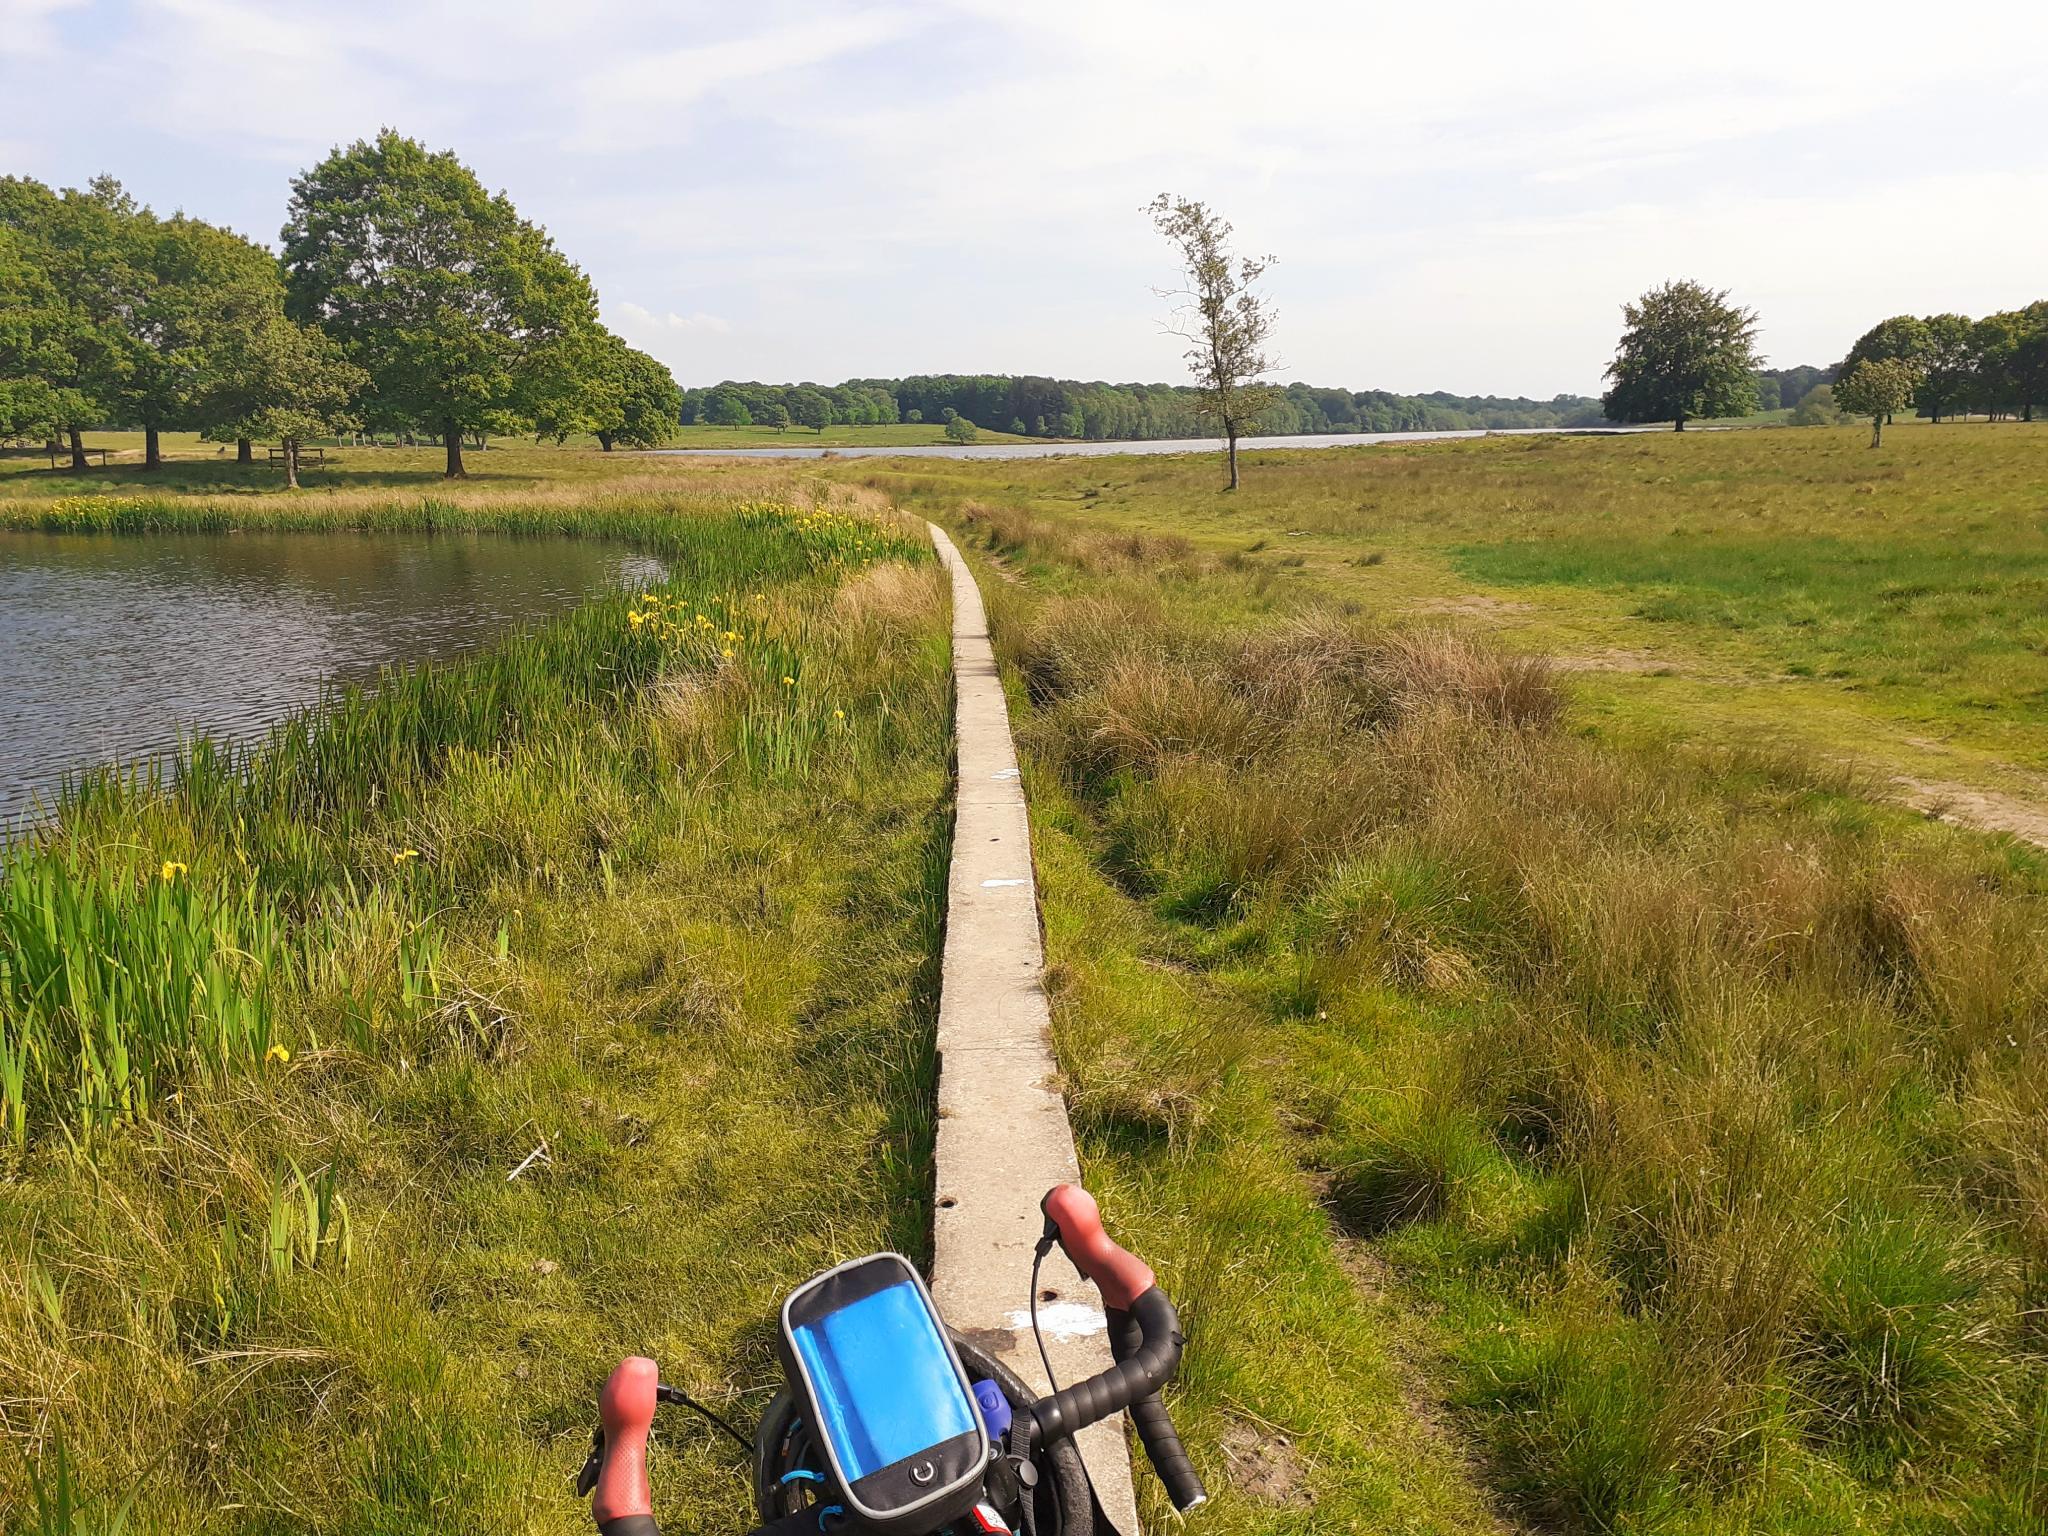 On my bike-20210603_212122-jpg